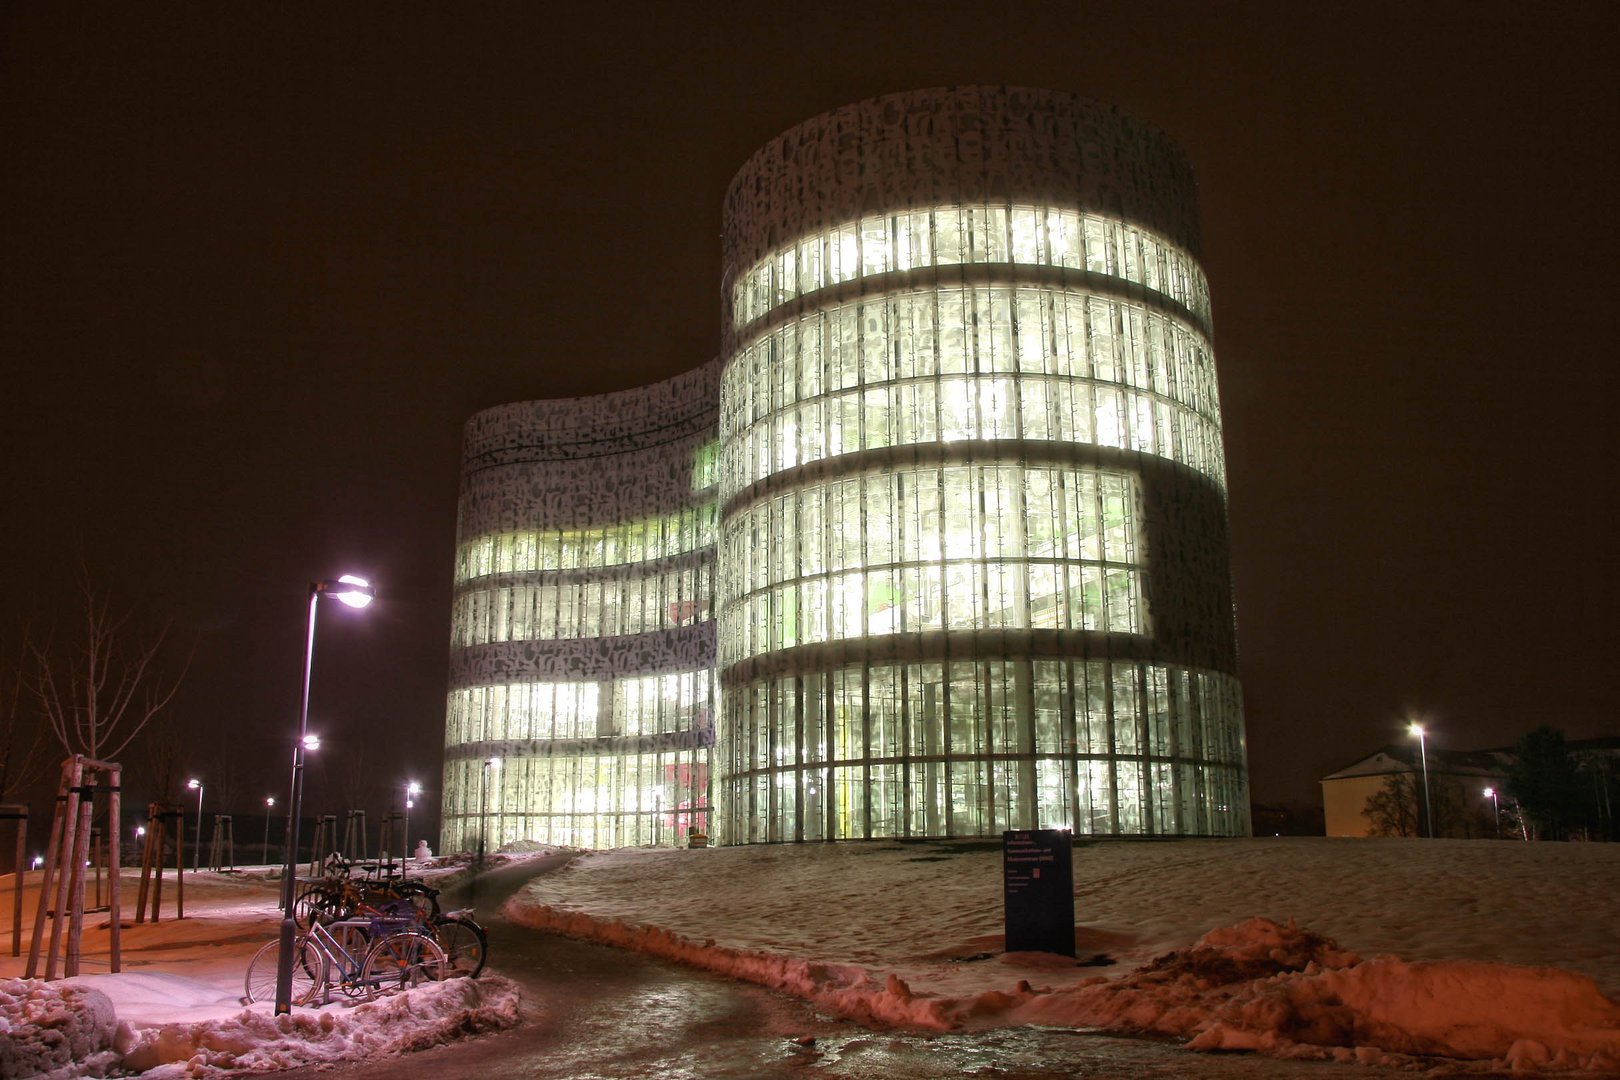 Uni - Bibliothek Cottbus